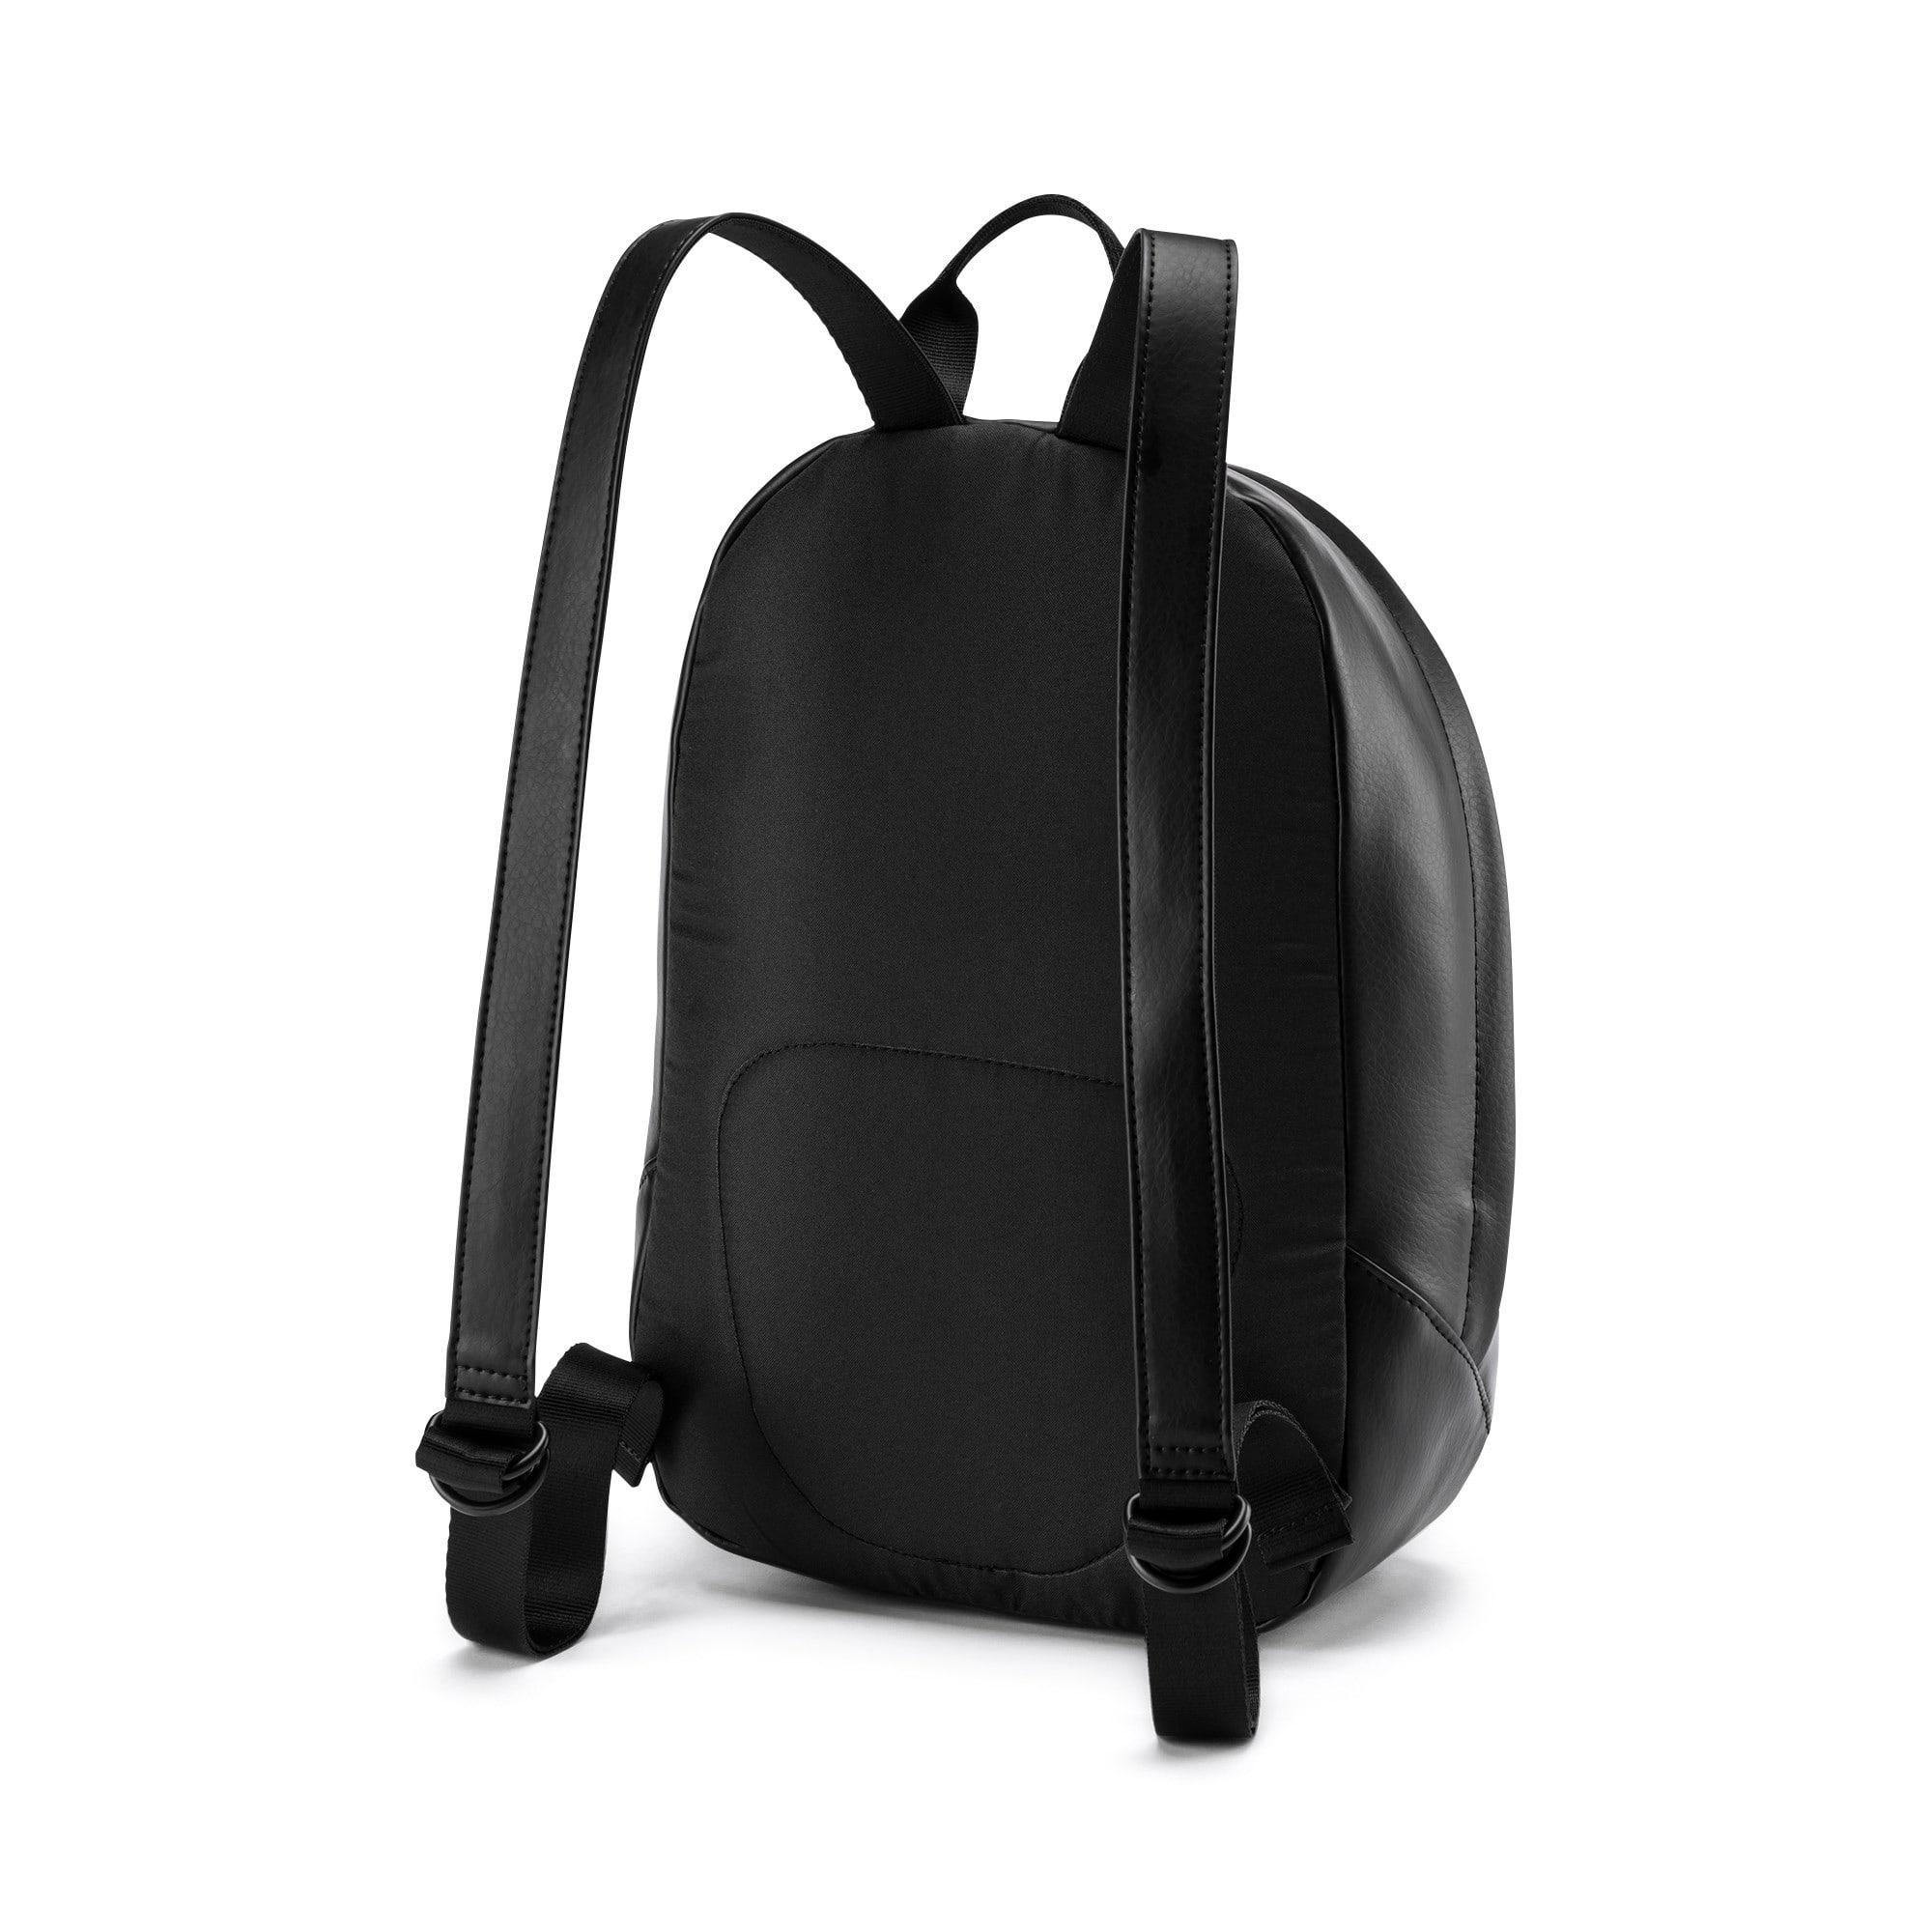 Thumbnail 3 of Premium Women's Backpack, Puma Black, medium-IND